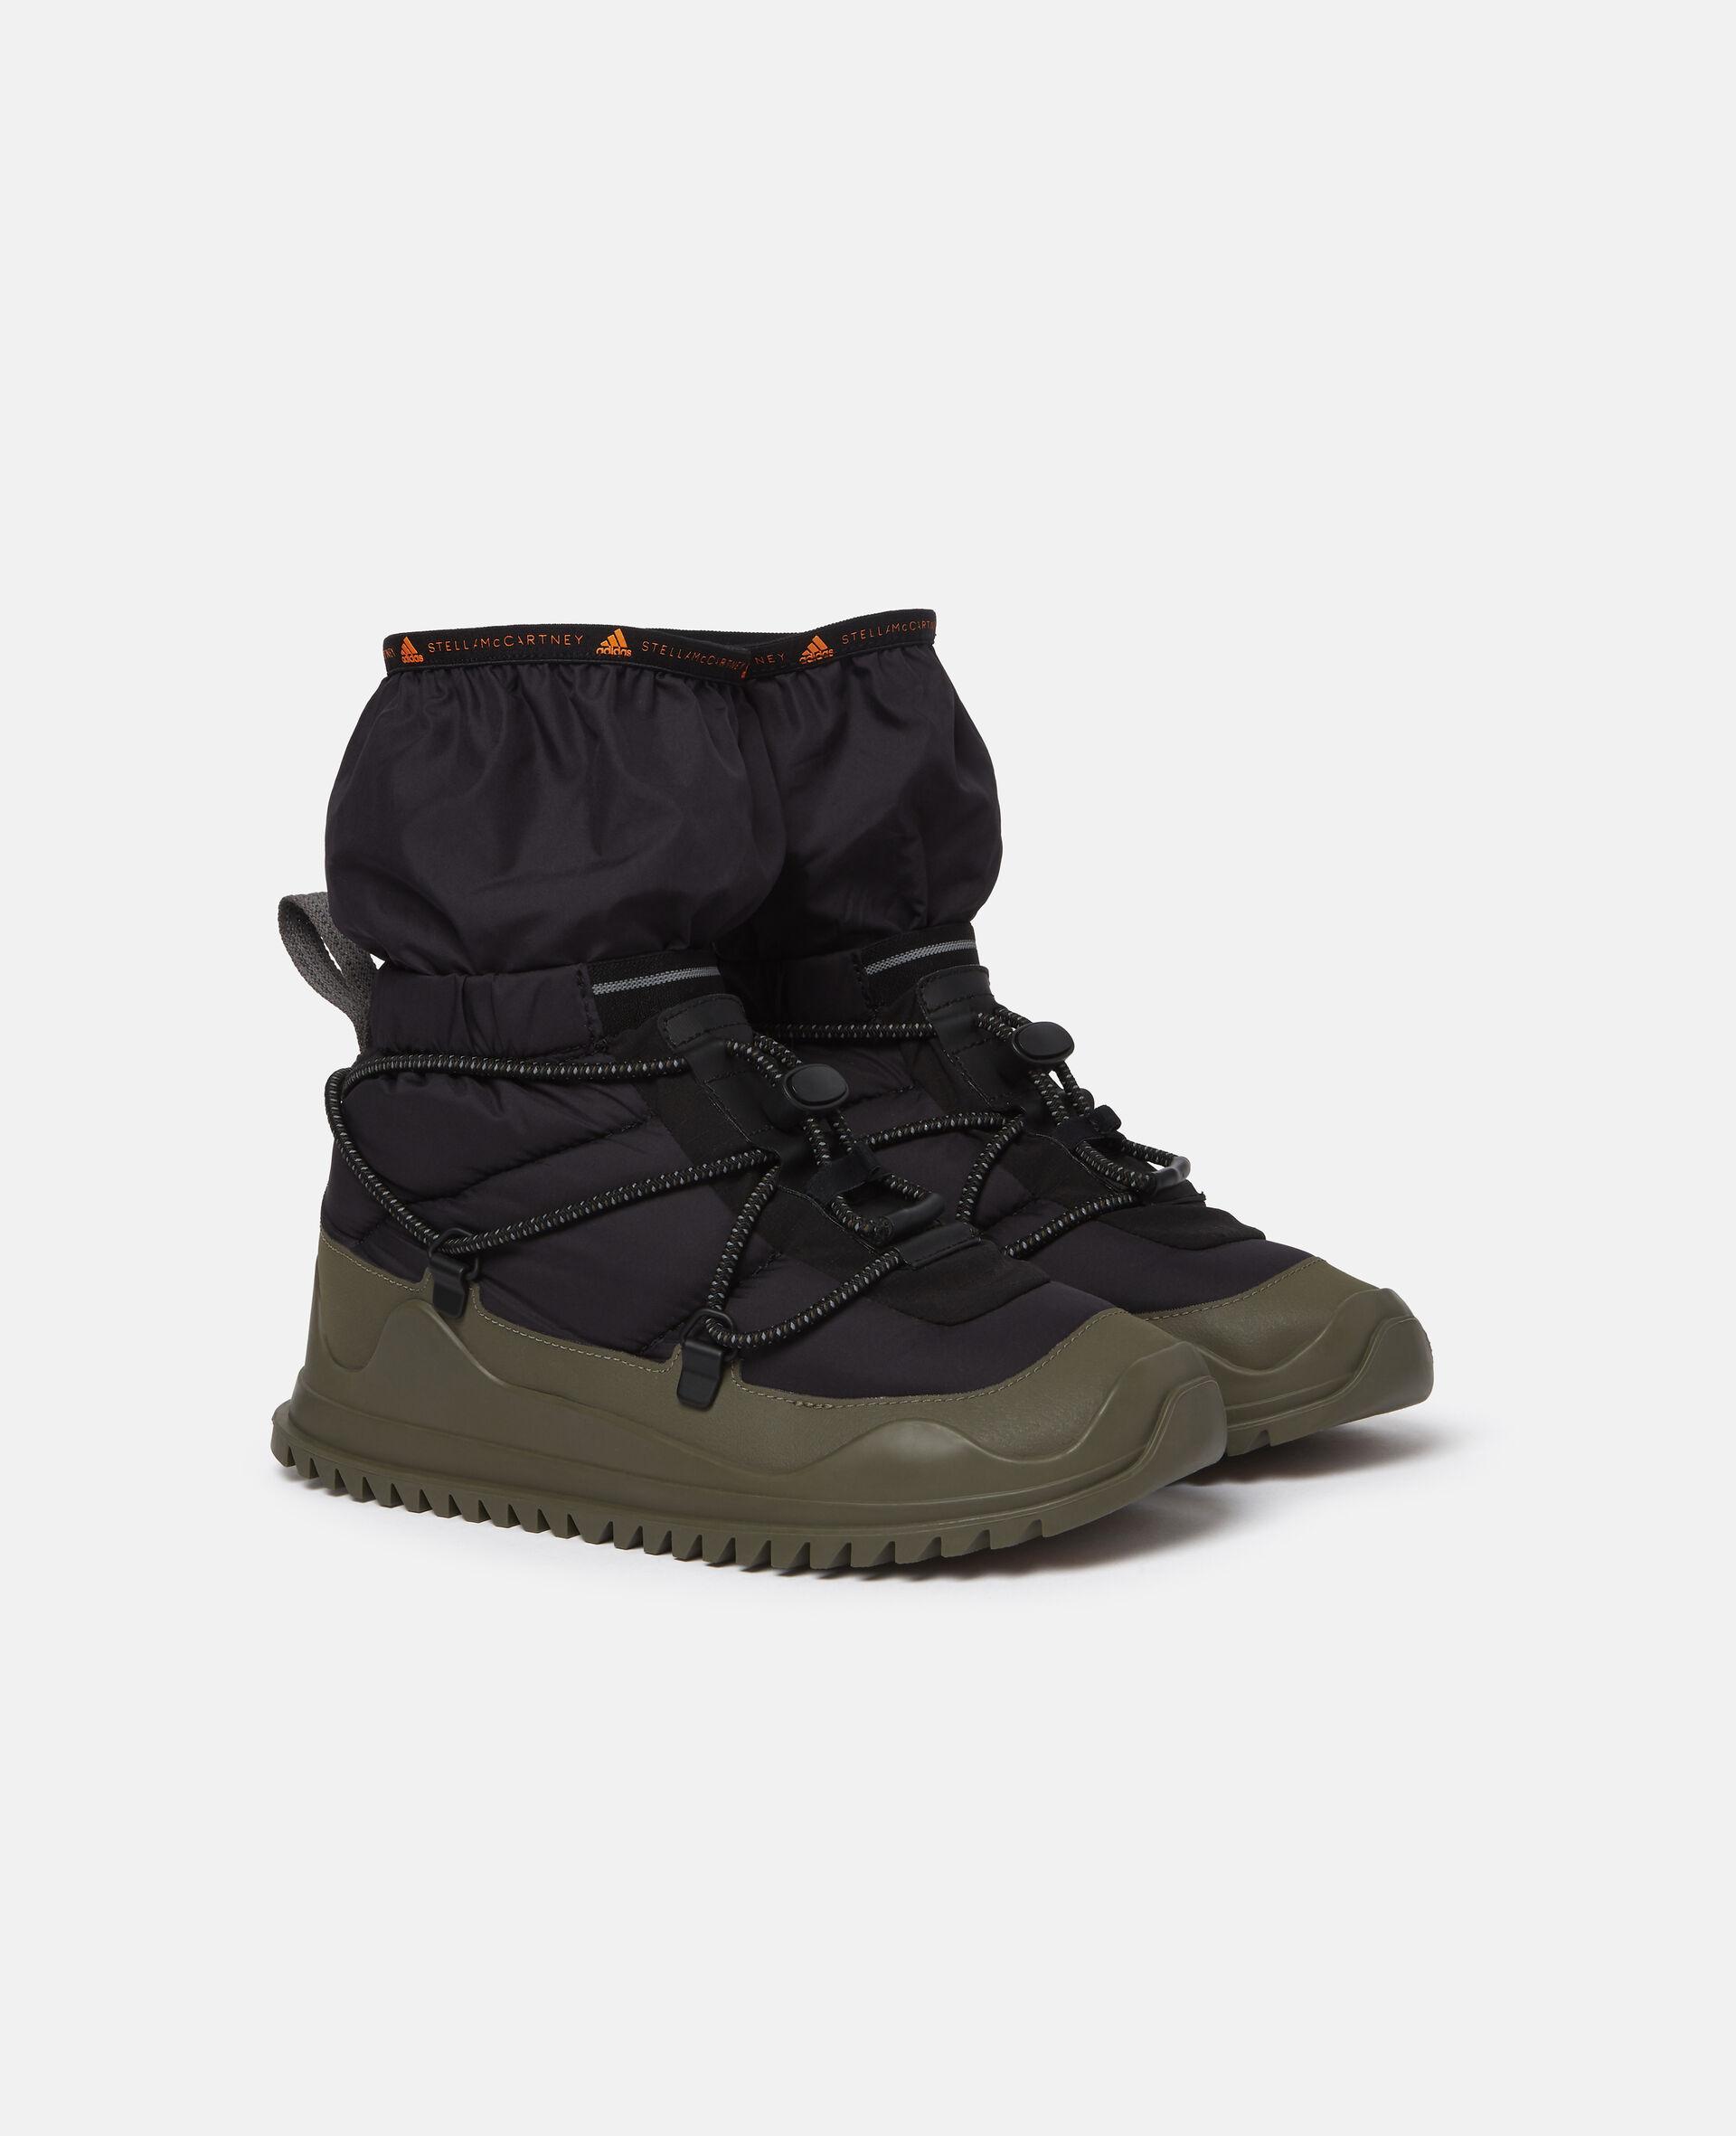 Winter Boots-Black-large image number 3